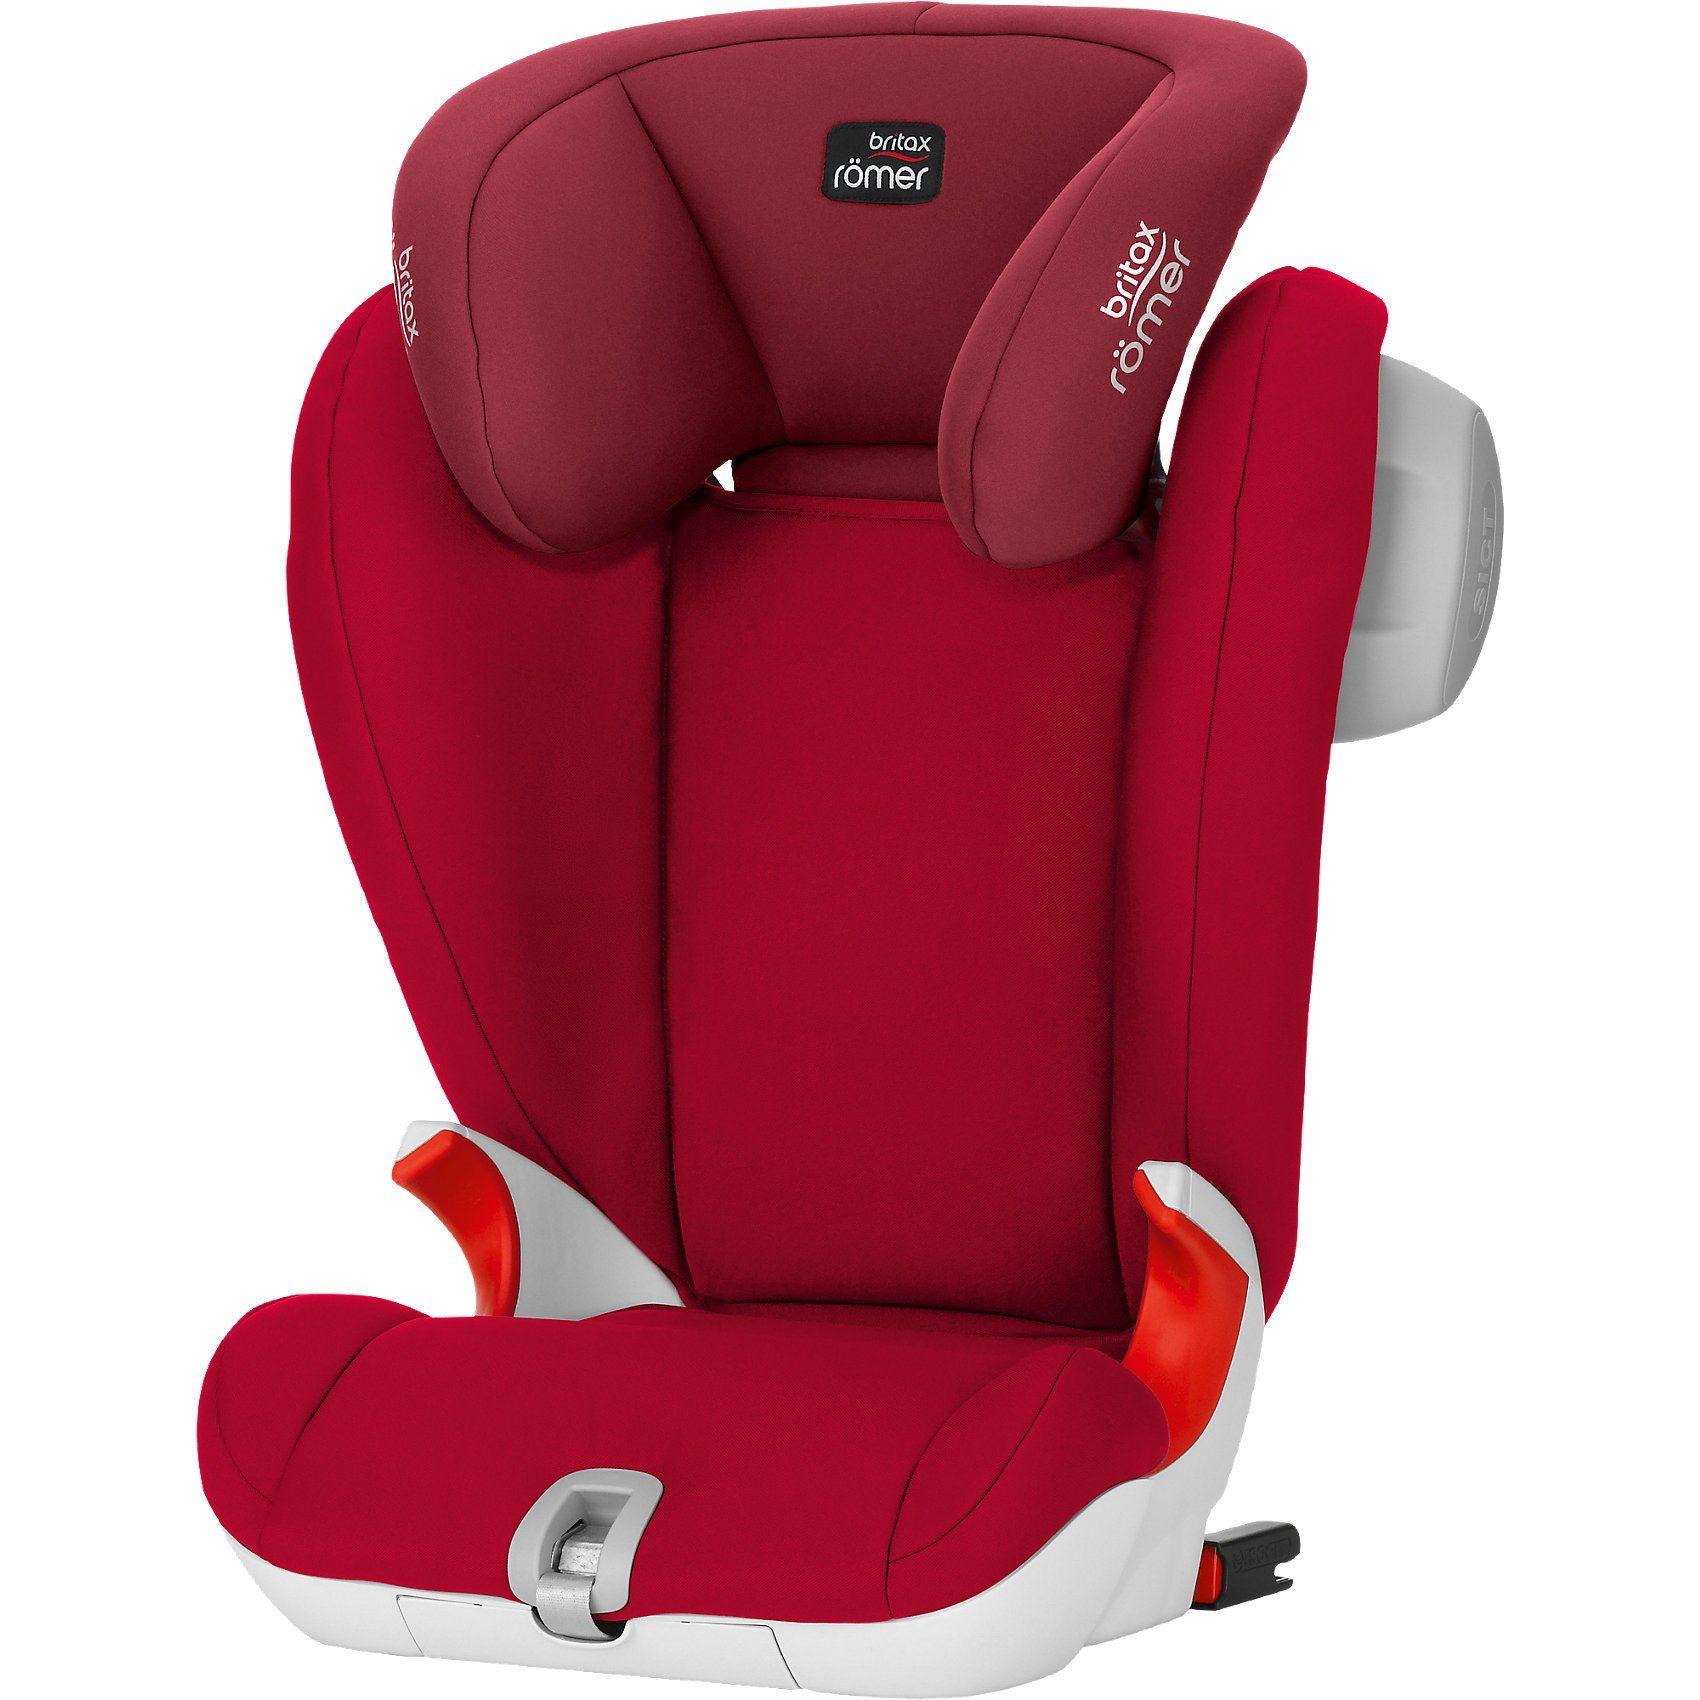 Britax Römer Auto-Kindersitz Kidfix SL Sict, Flame Red, 2016